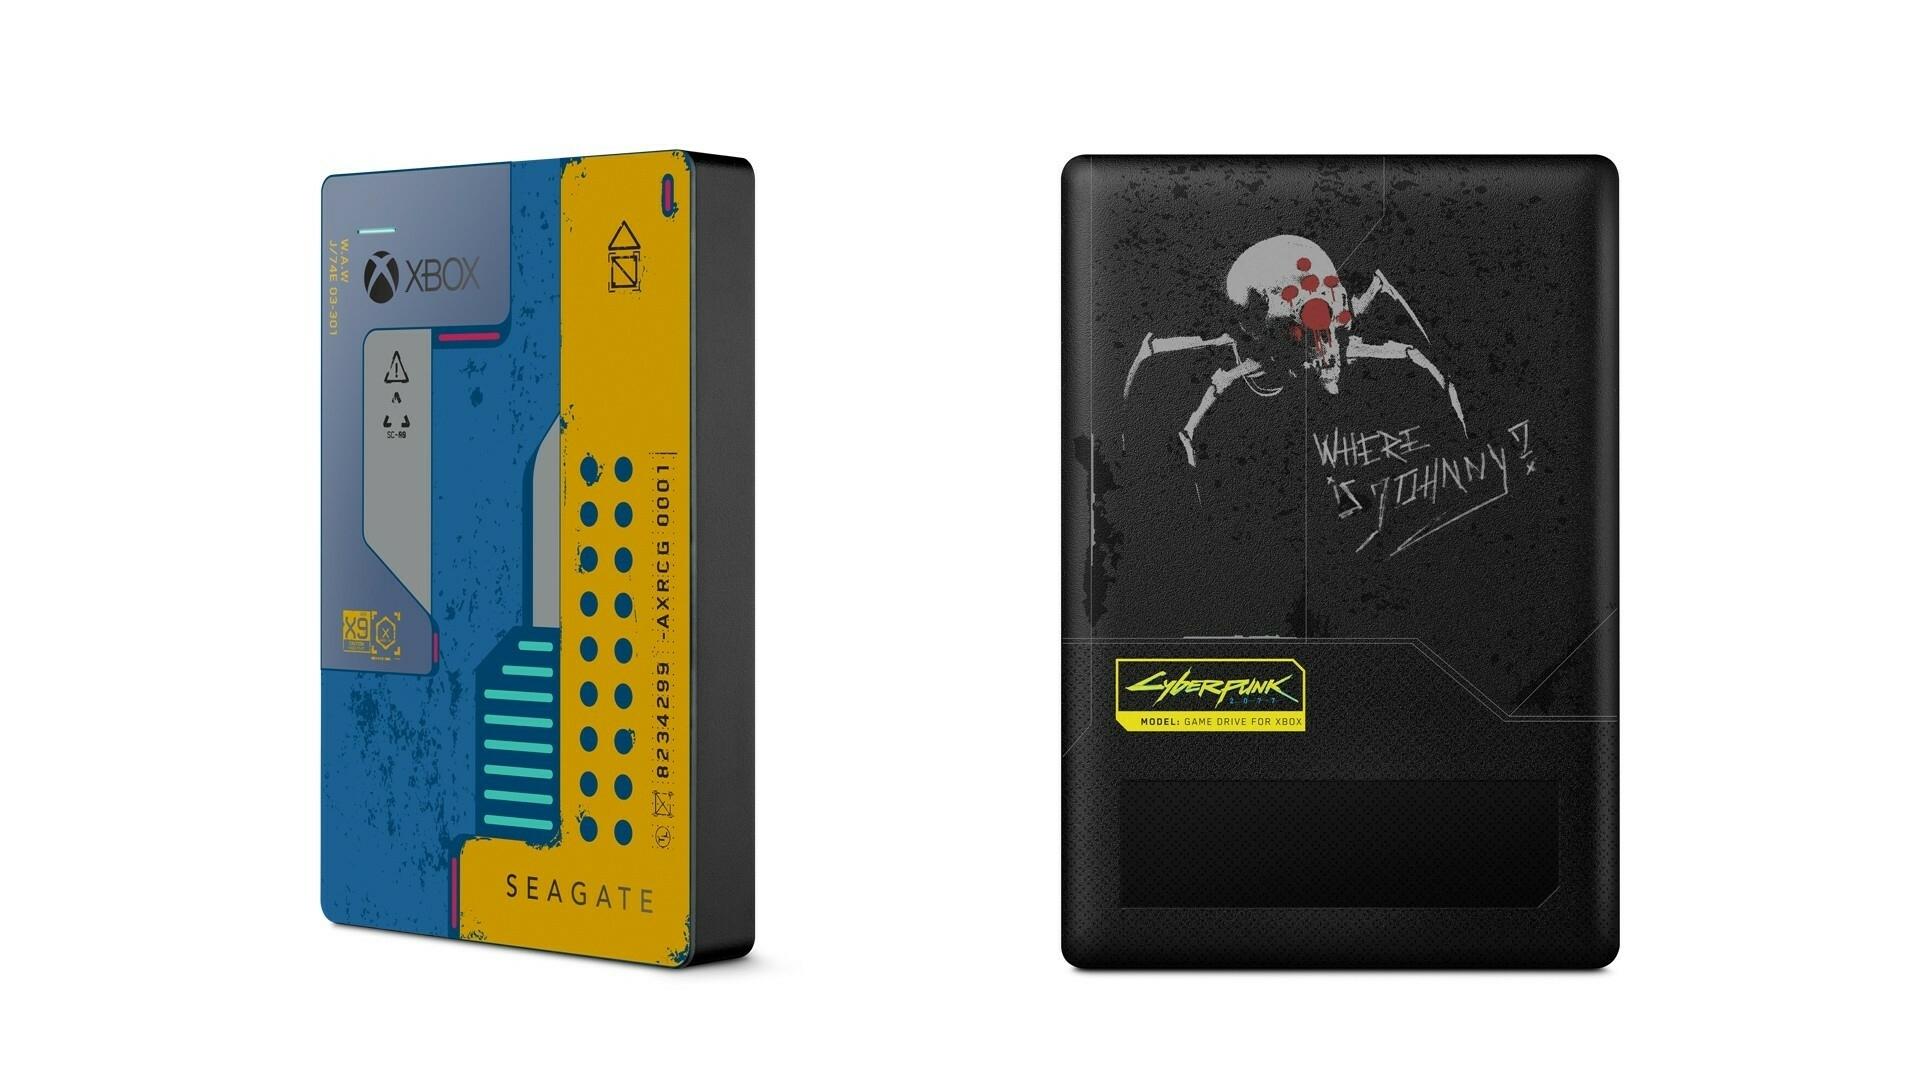 Внешний жесткий диск Seagate Game Drive for Xbox Cyberpunk 2077 Special Edition